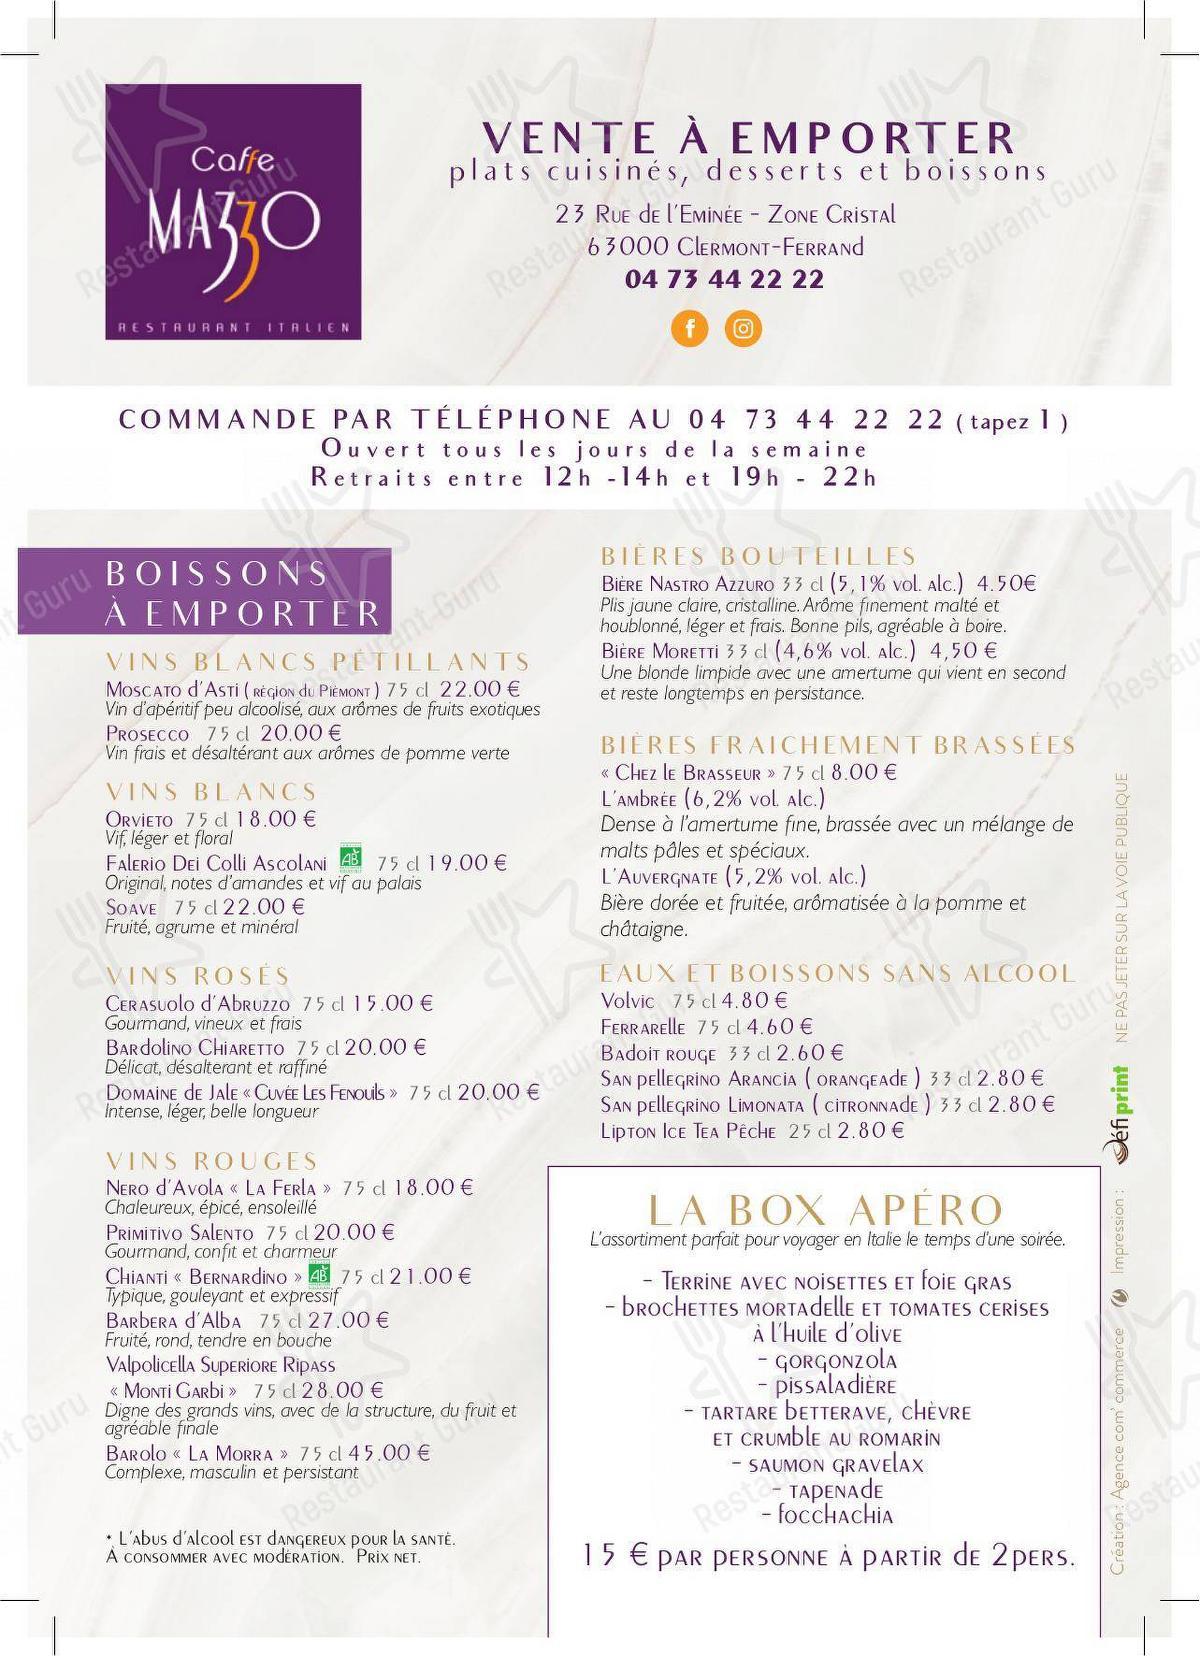 caffe mazzo restaurant clermont